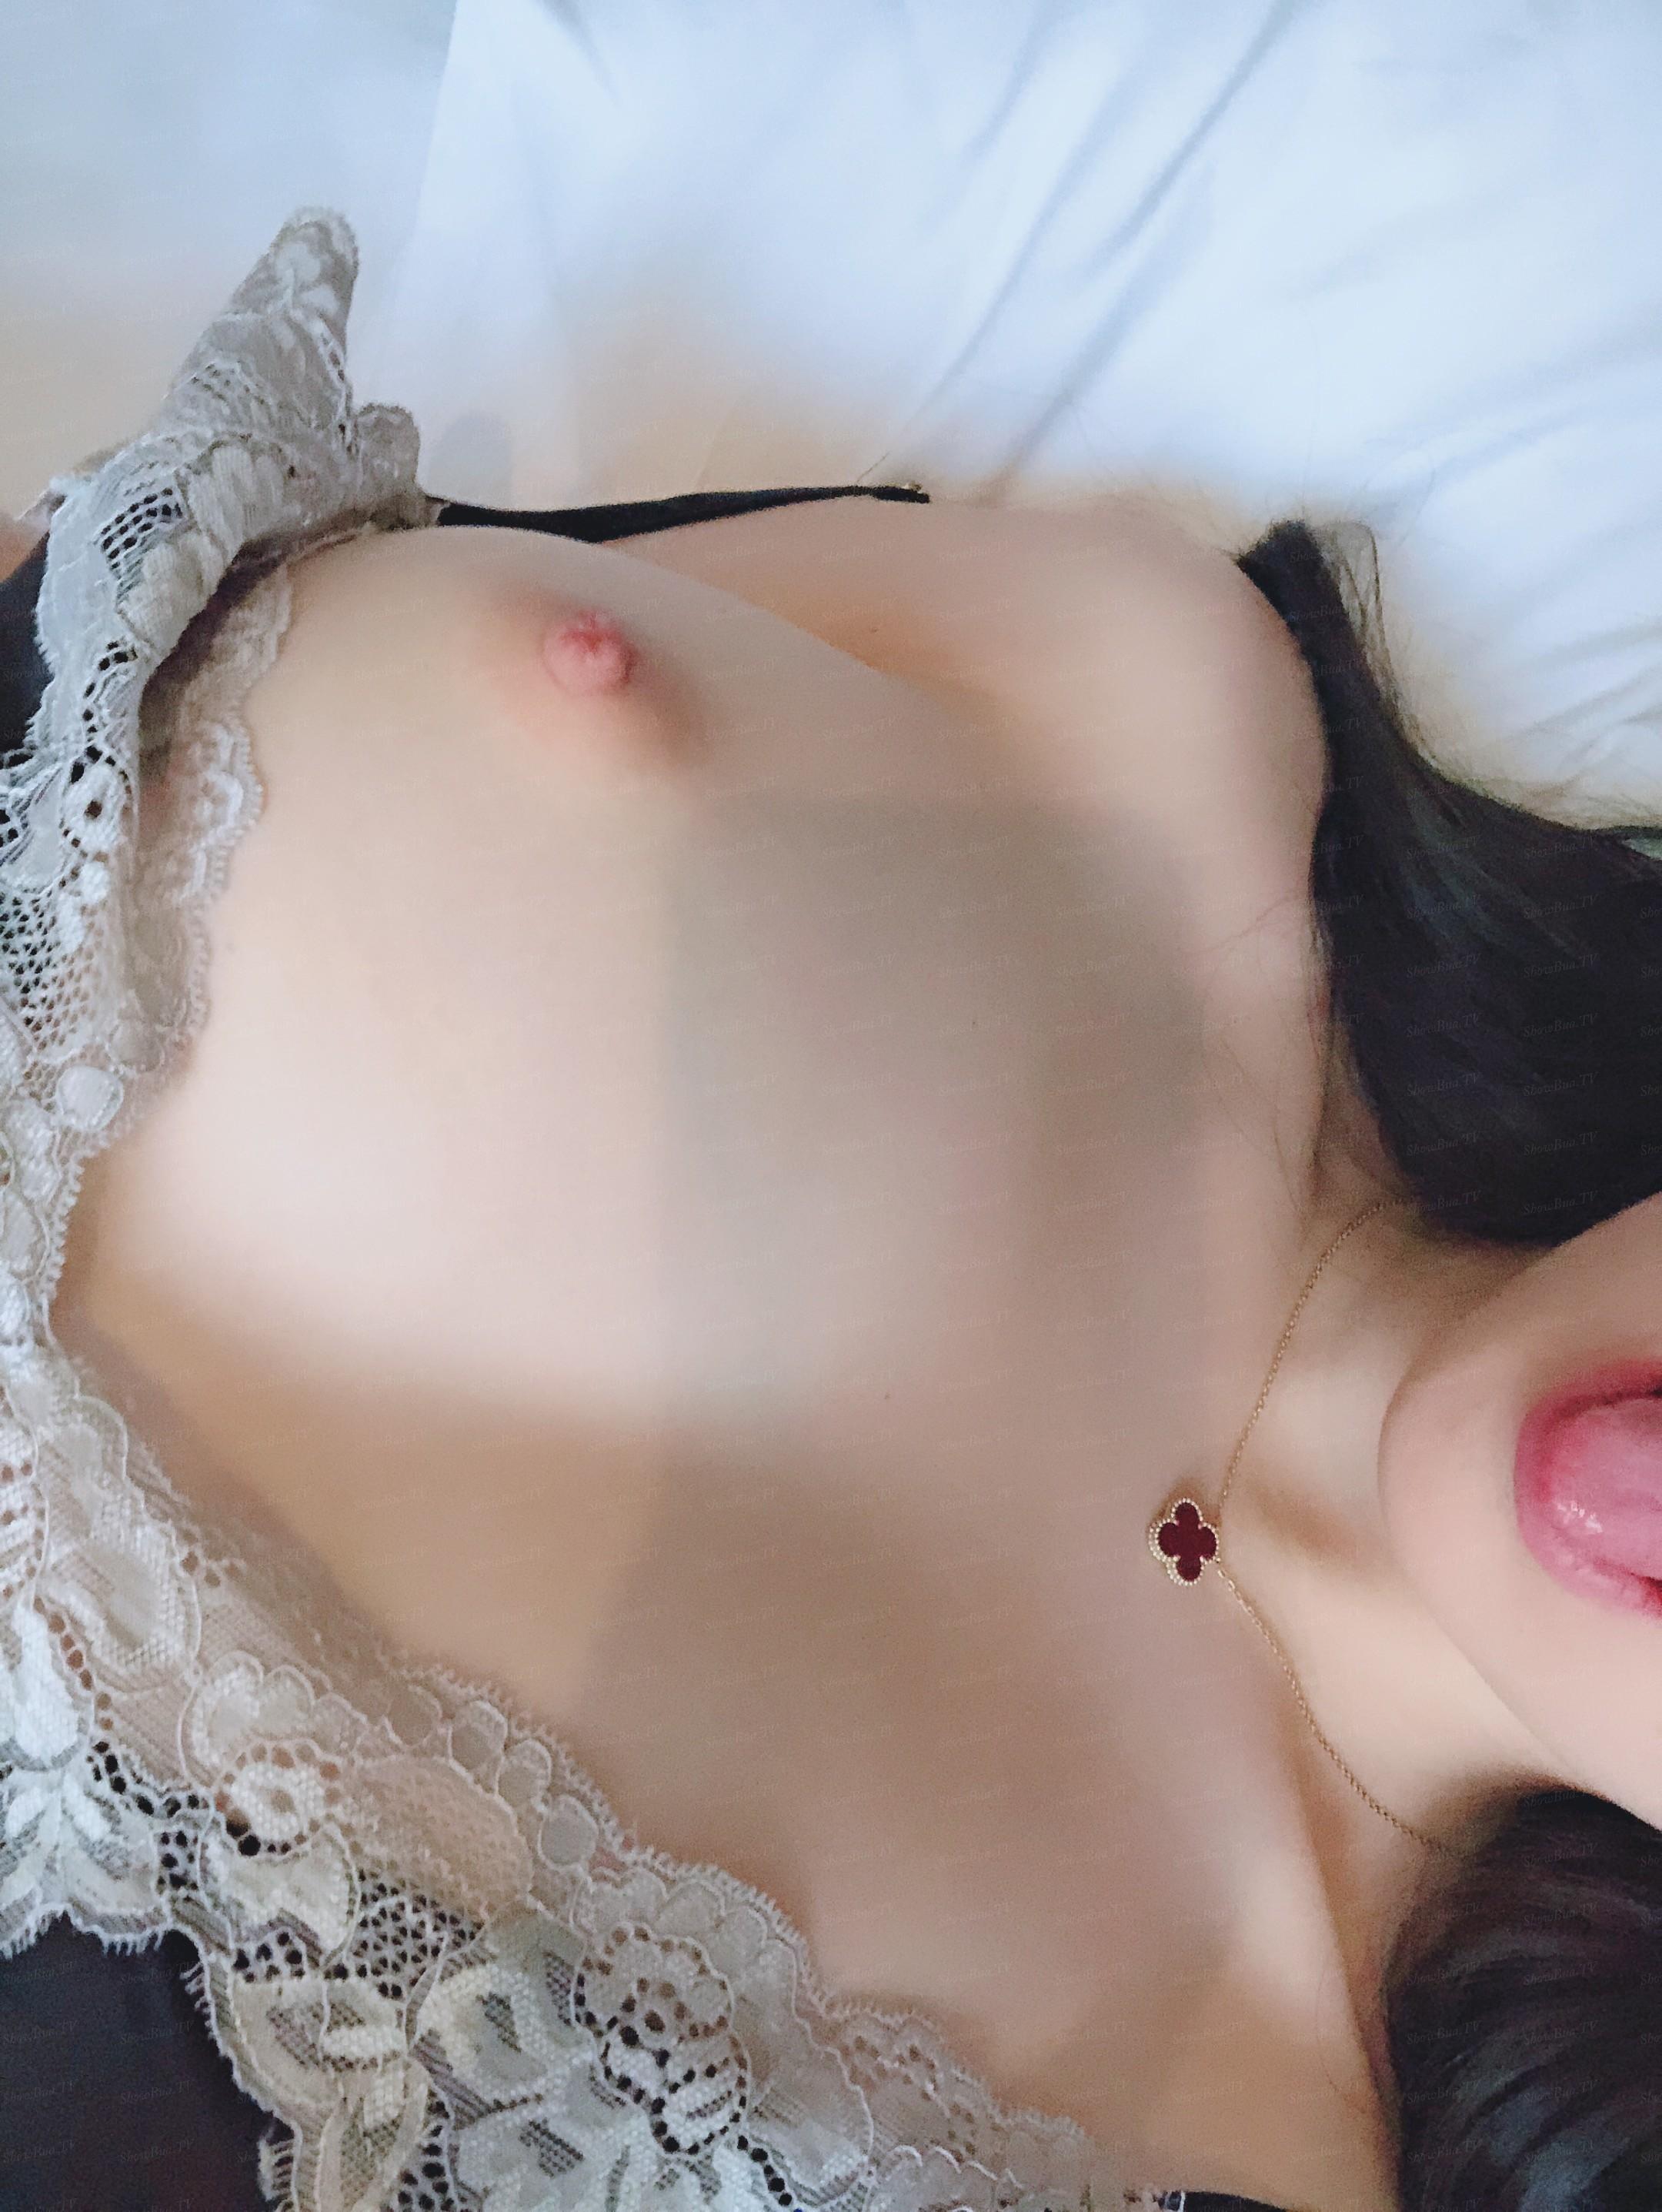 showbuatv-hotgirl-dang-dep-tha-hon-dam-vao-loat-anh-tu-suong-kich-thich-4